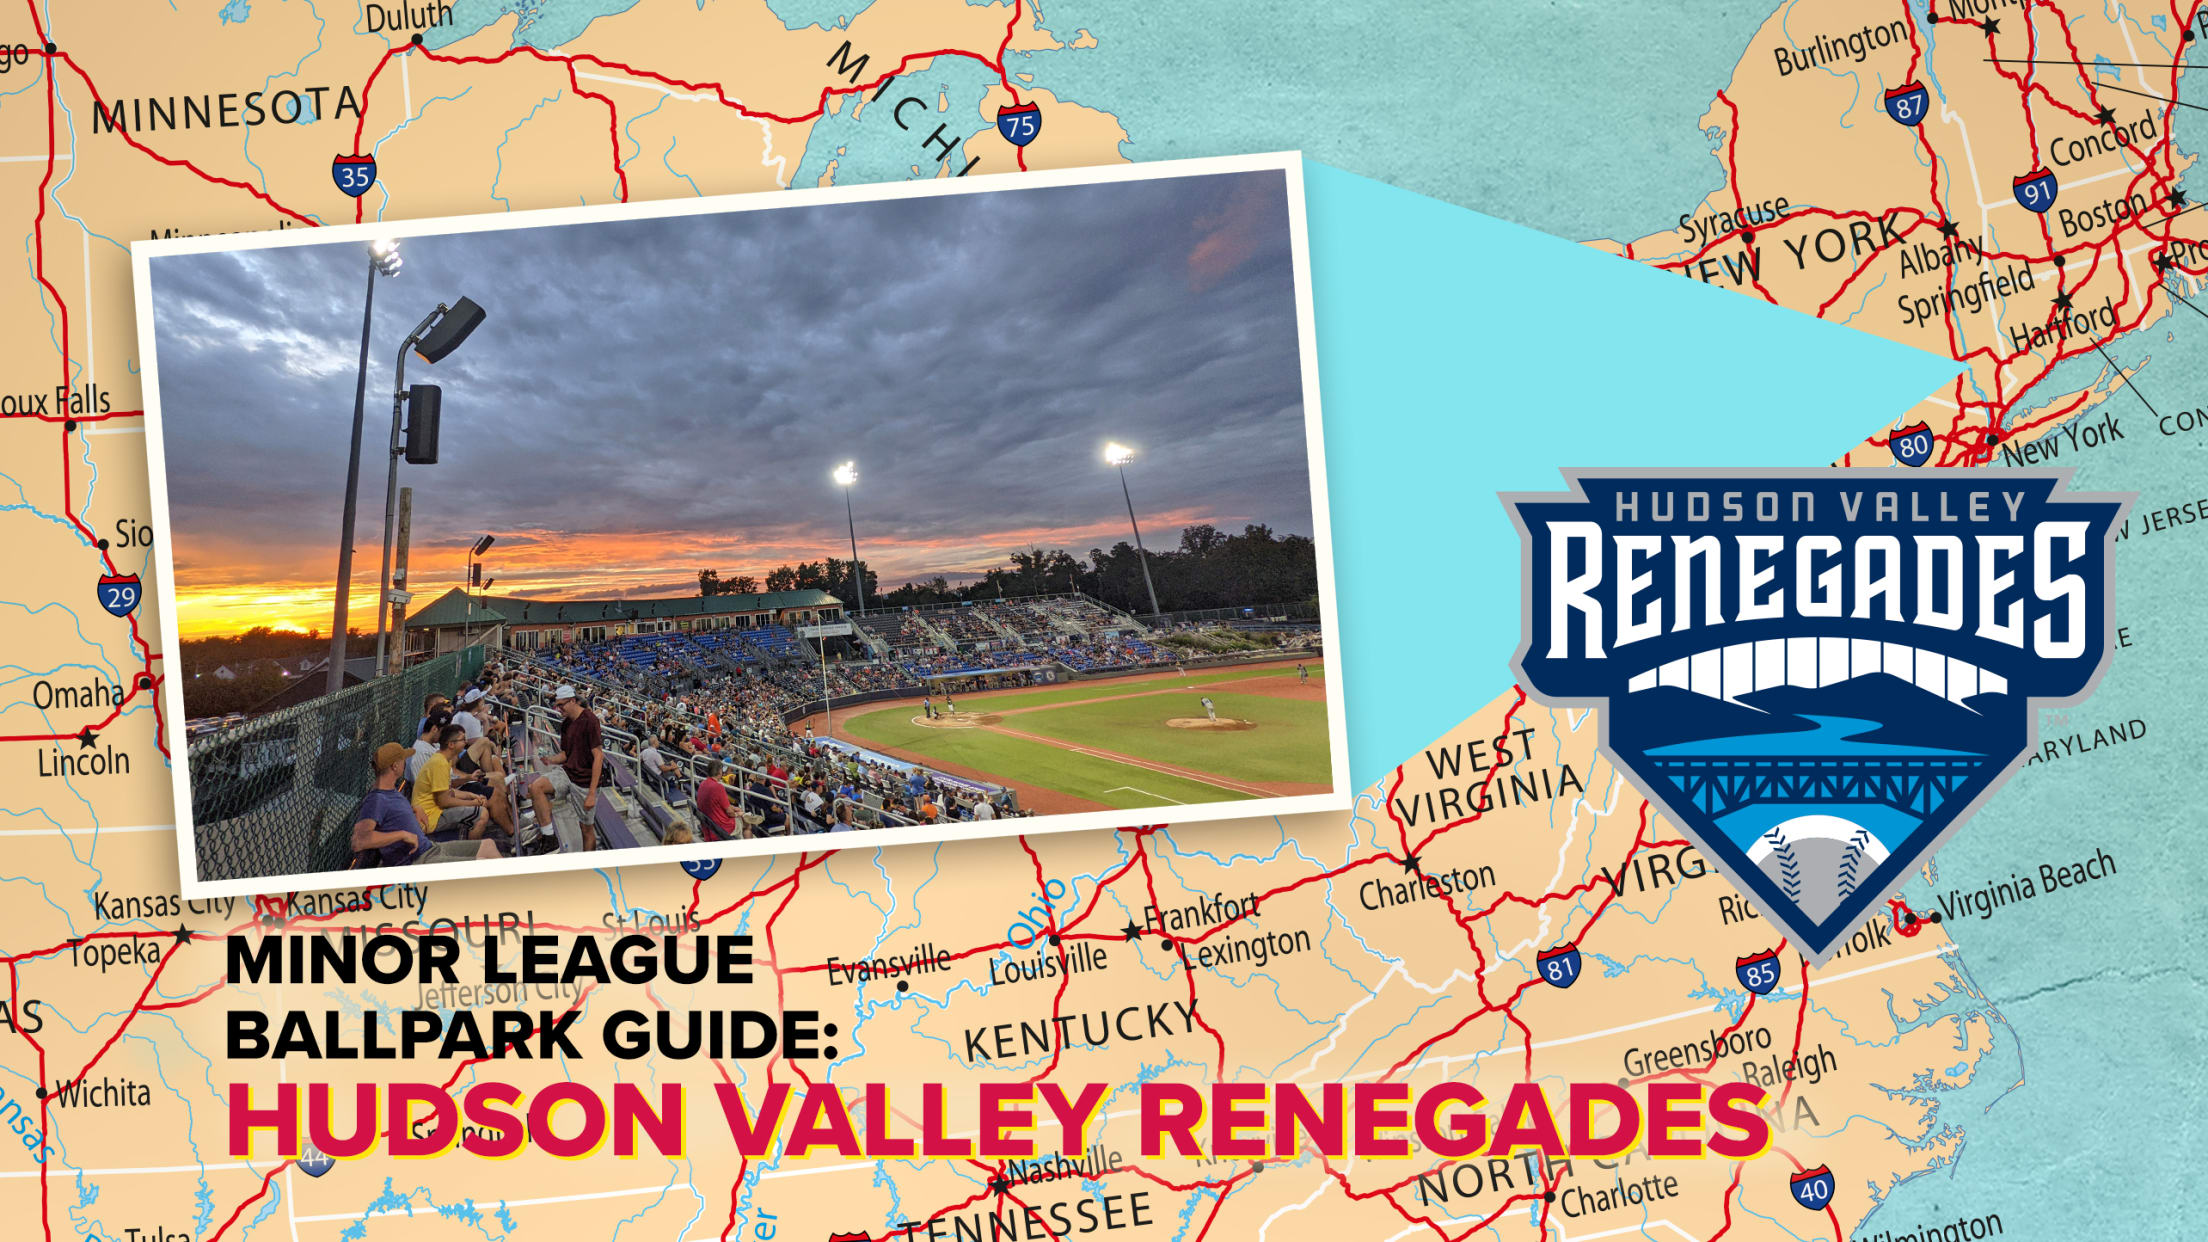 2568x1445-Stadium_Map_Hudson_Valley